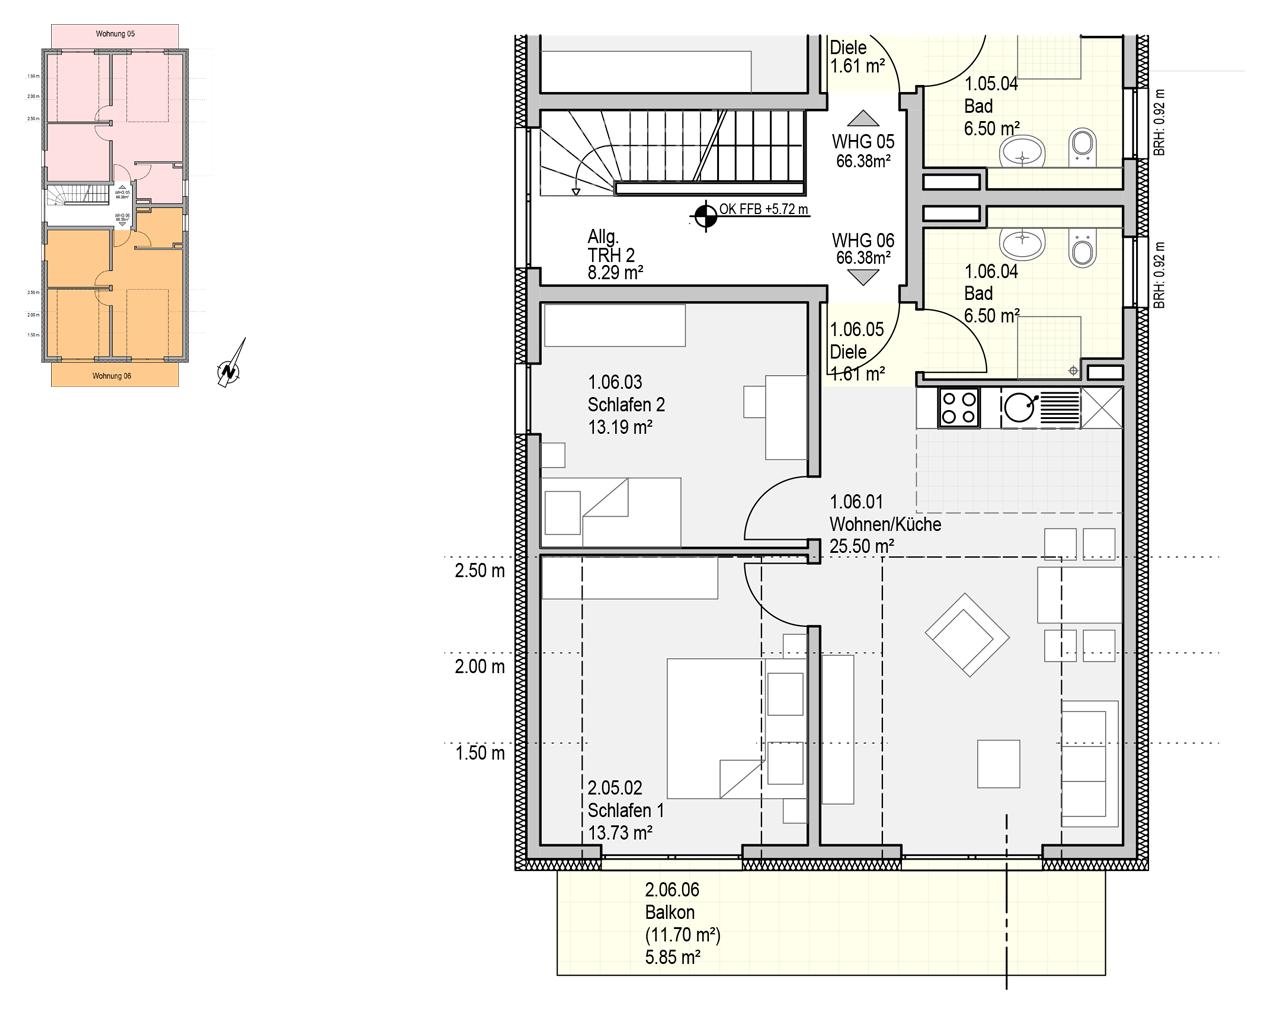 Nr. 6 - DG - 3 Zimmer - 66,38m²